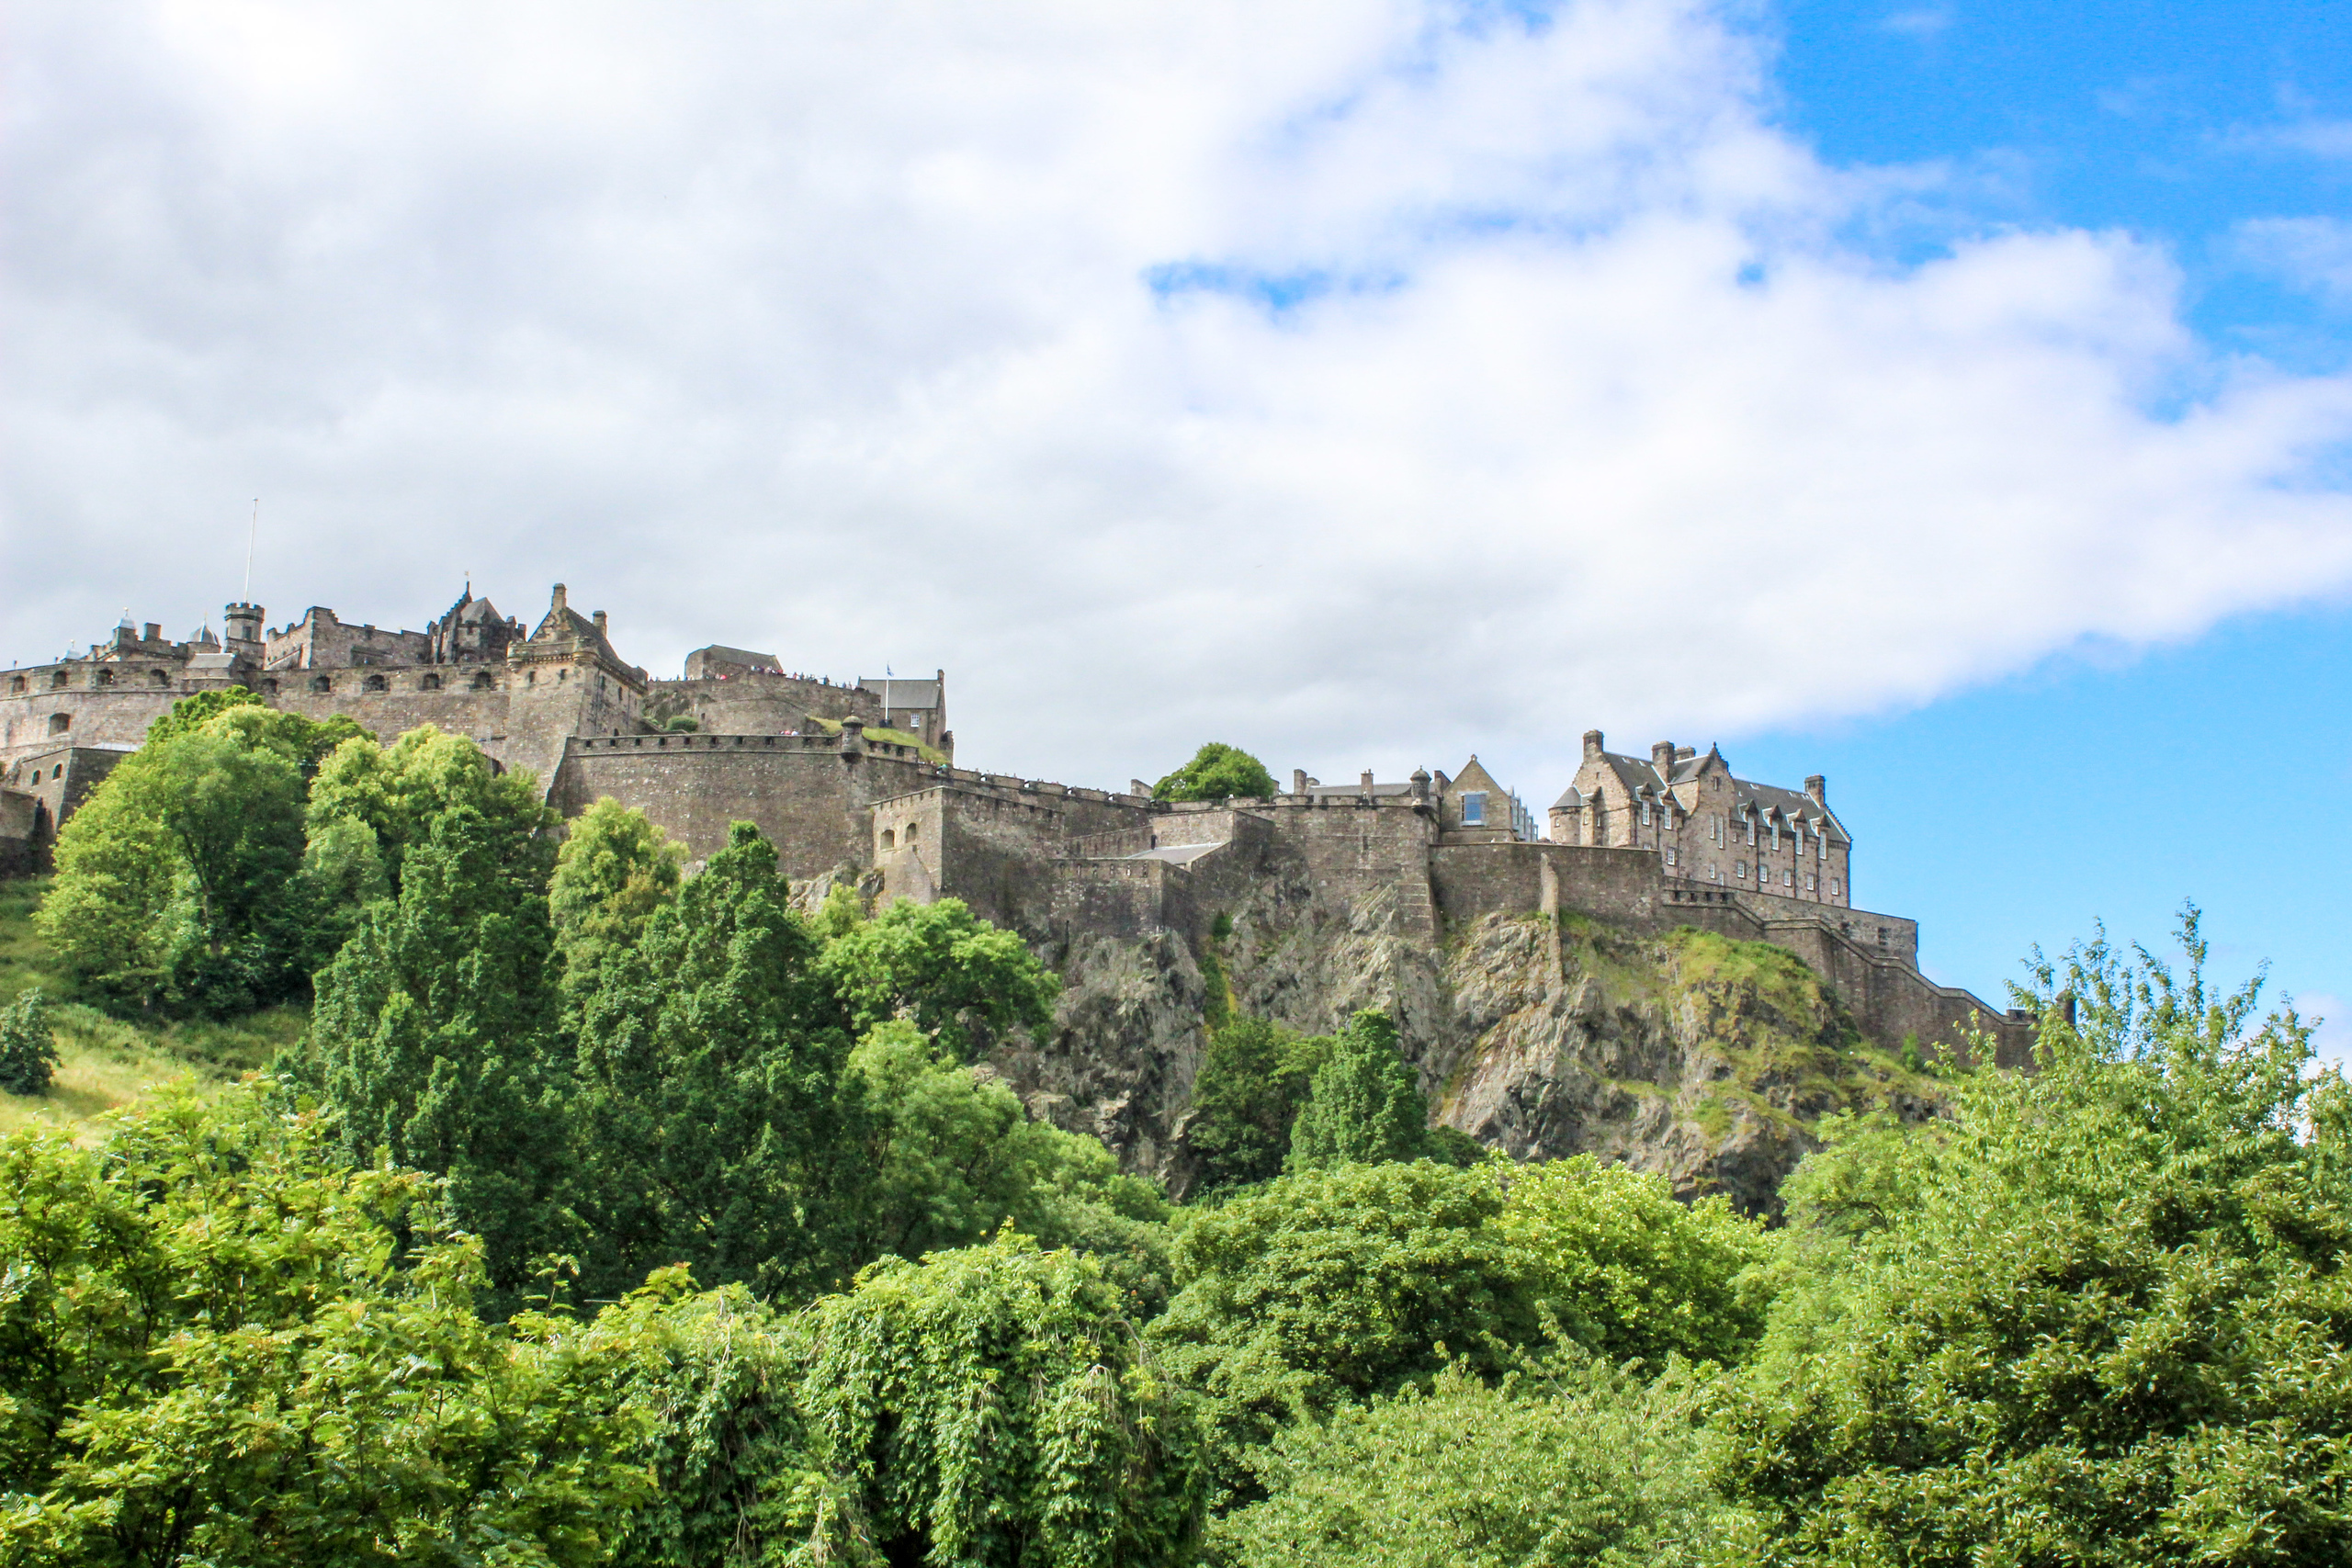 travel advice for scotland: go to the edinburgh castle early